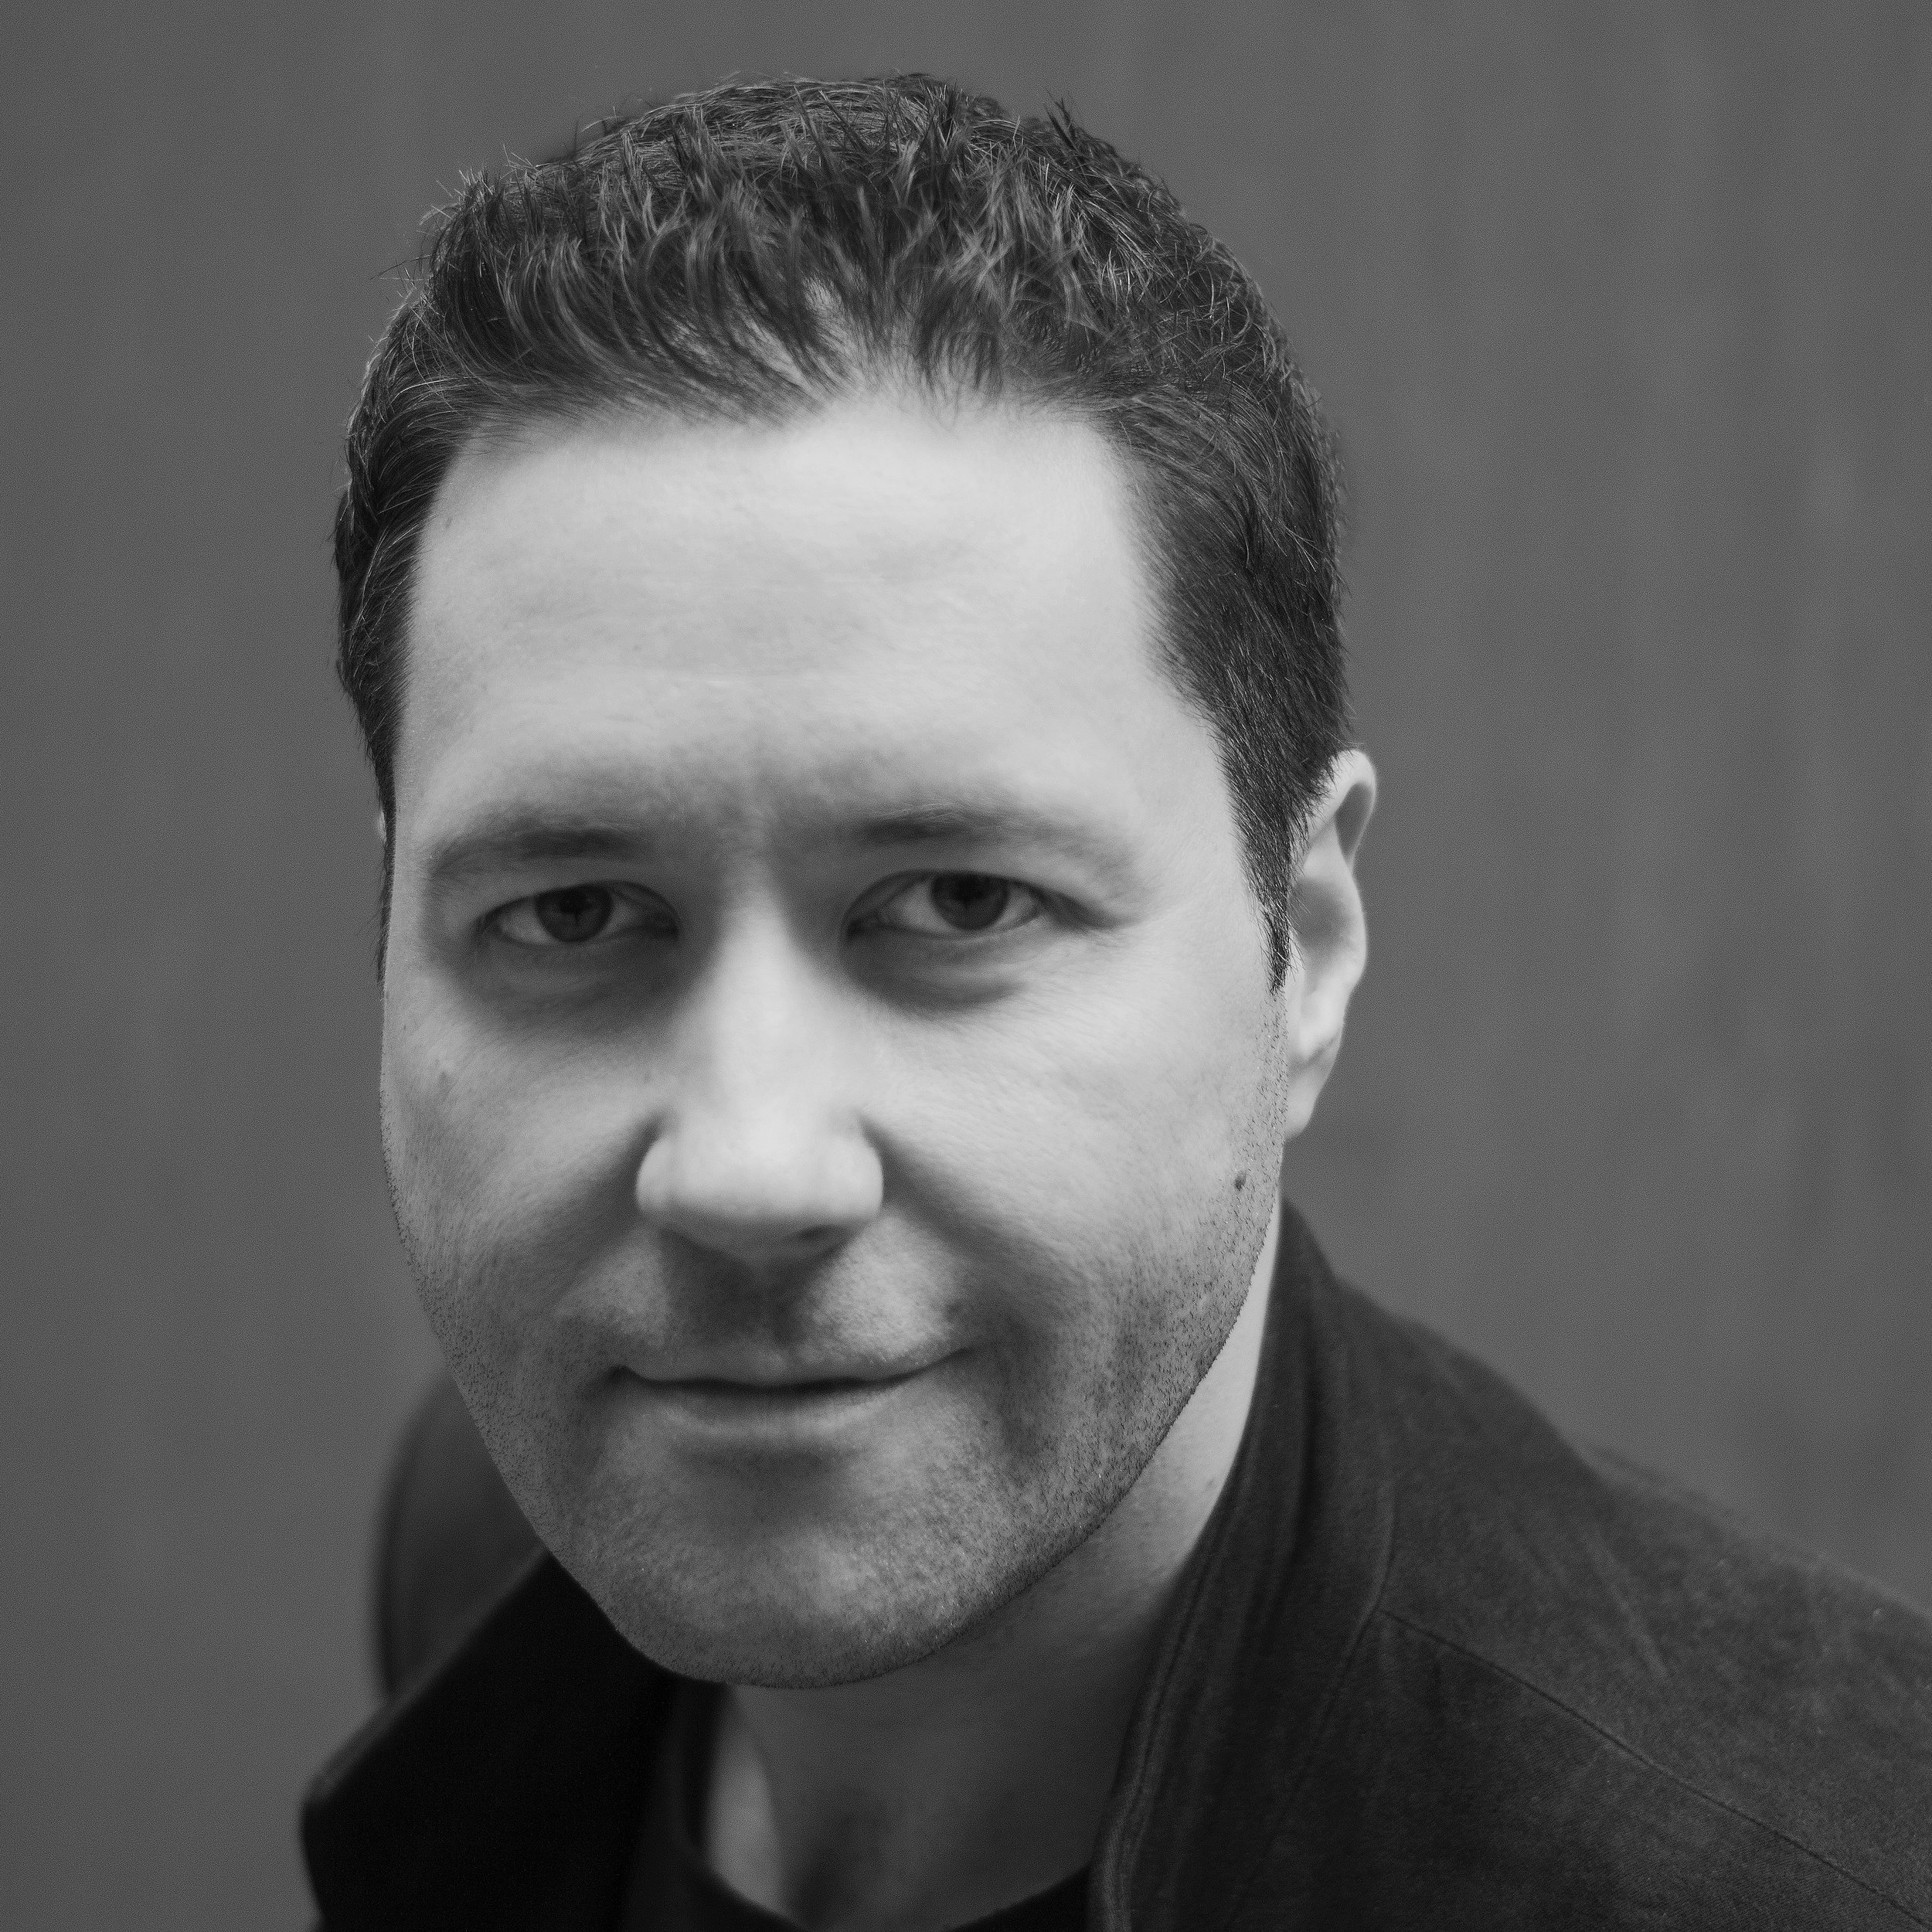 Michael L Roberts Headshot 2019 Web Square.jpg